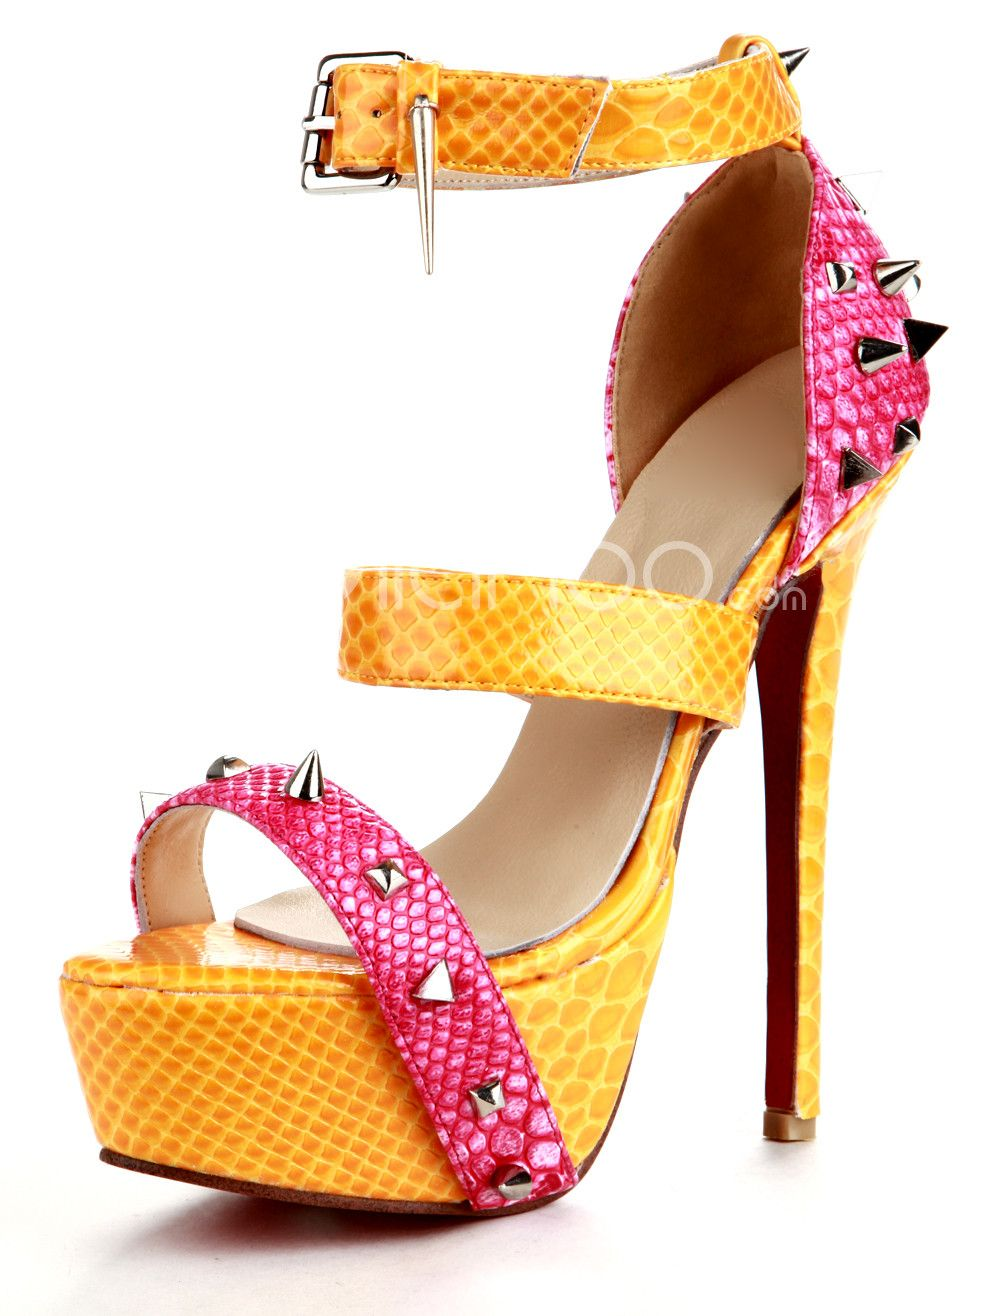 Gold Criss-Cross PU Womans Peep Toe Shoes - Milanoo.com